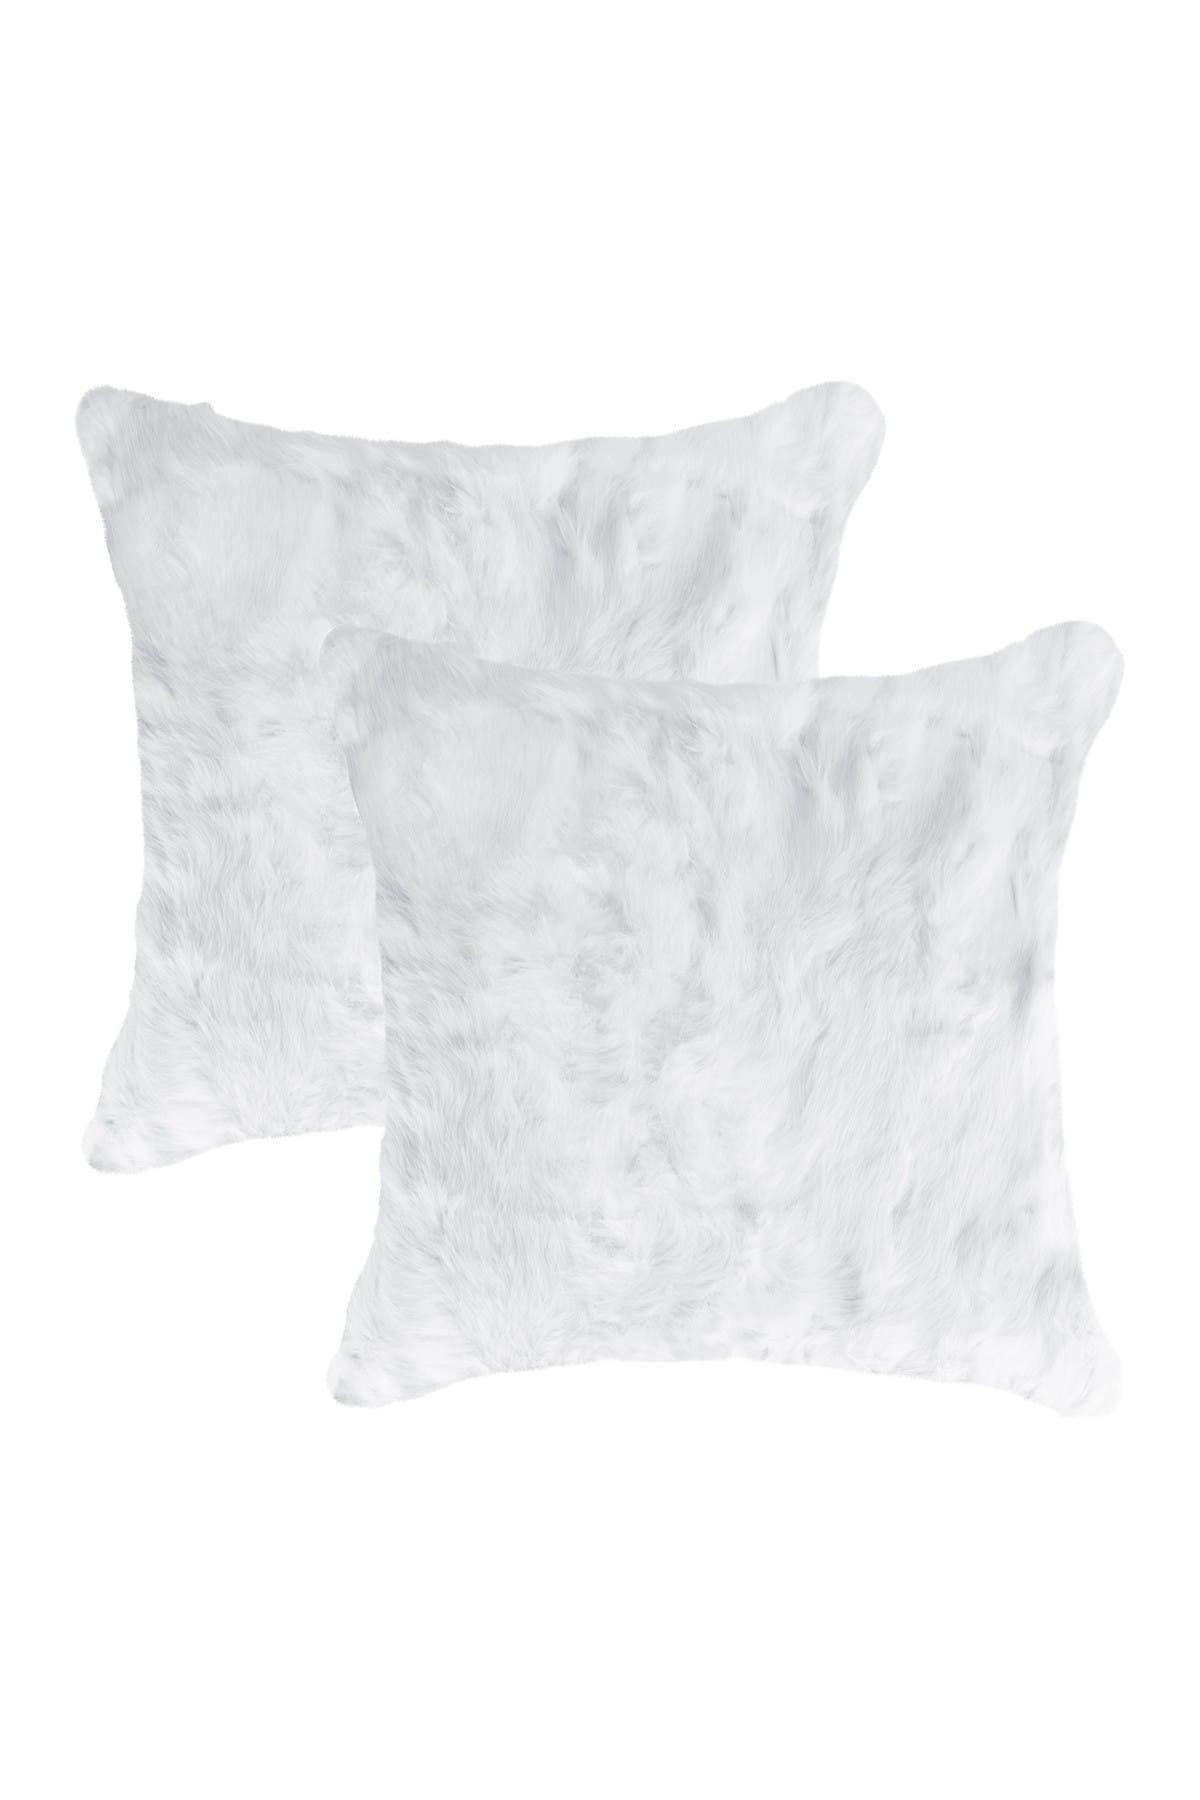 "Image of Natural Genuine Rabbit Fur Pillow - Set of 2 - 18"" x 18"" - White"